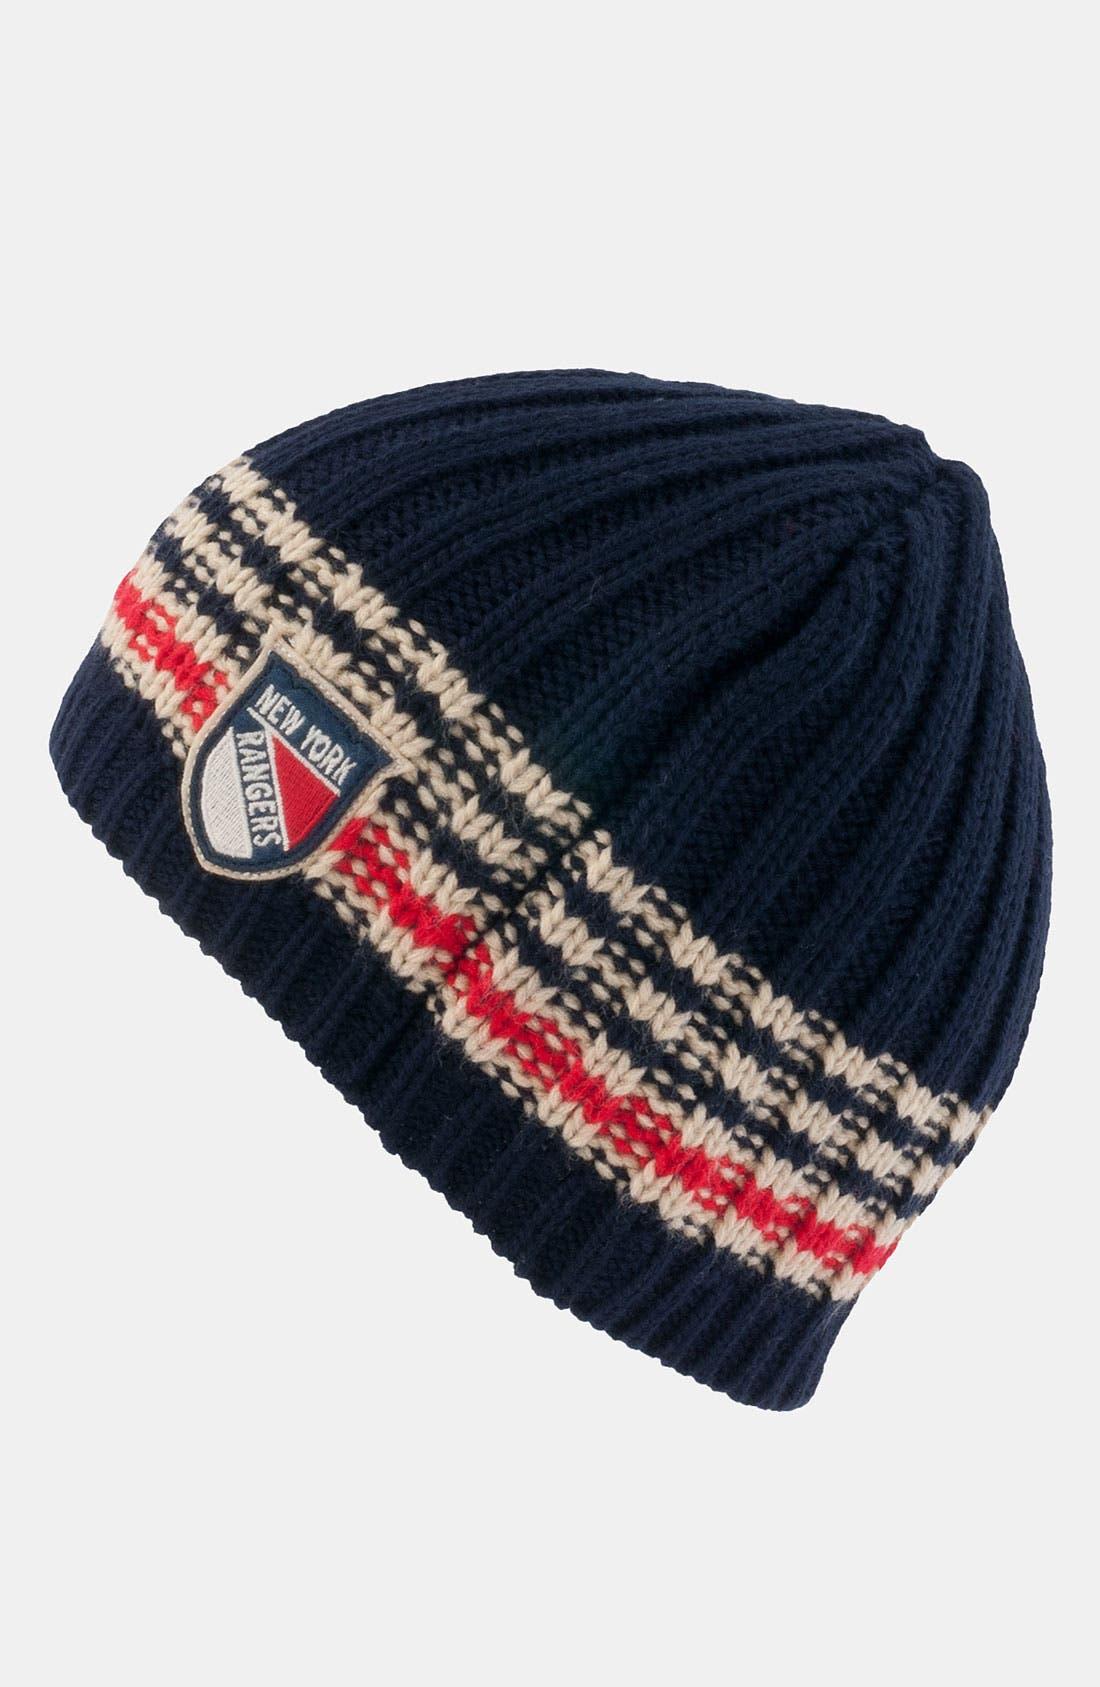 Main Image - American Needle 'New York Rangers - Targhee' Knit Hat